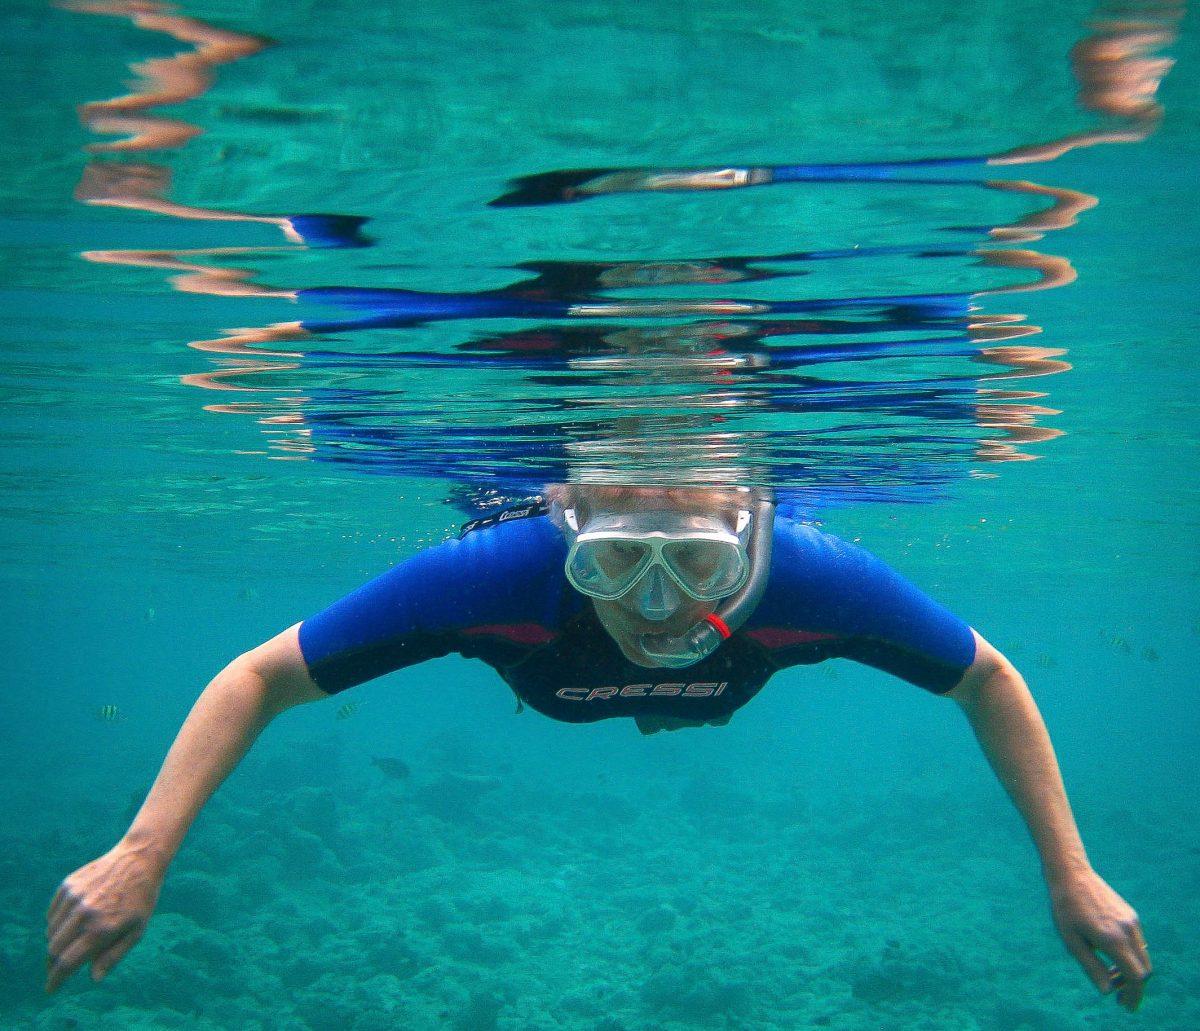 The snorkeller